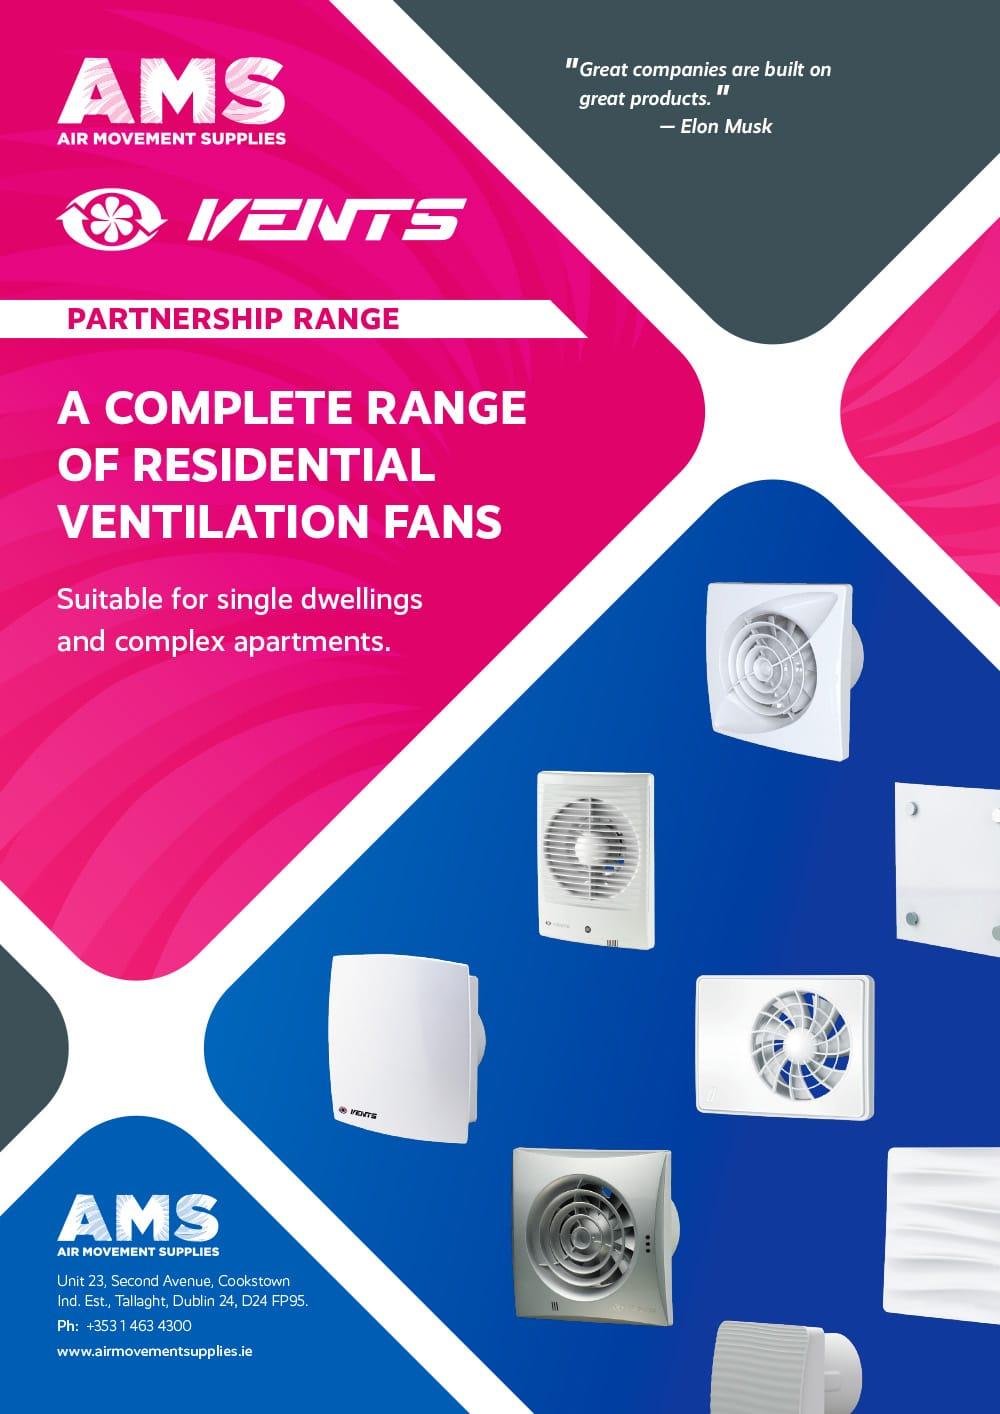 AMS Vents Partnership Range Domestic Ventilation